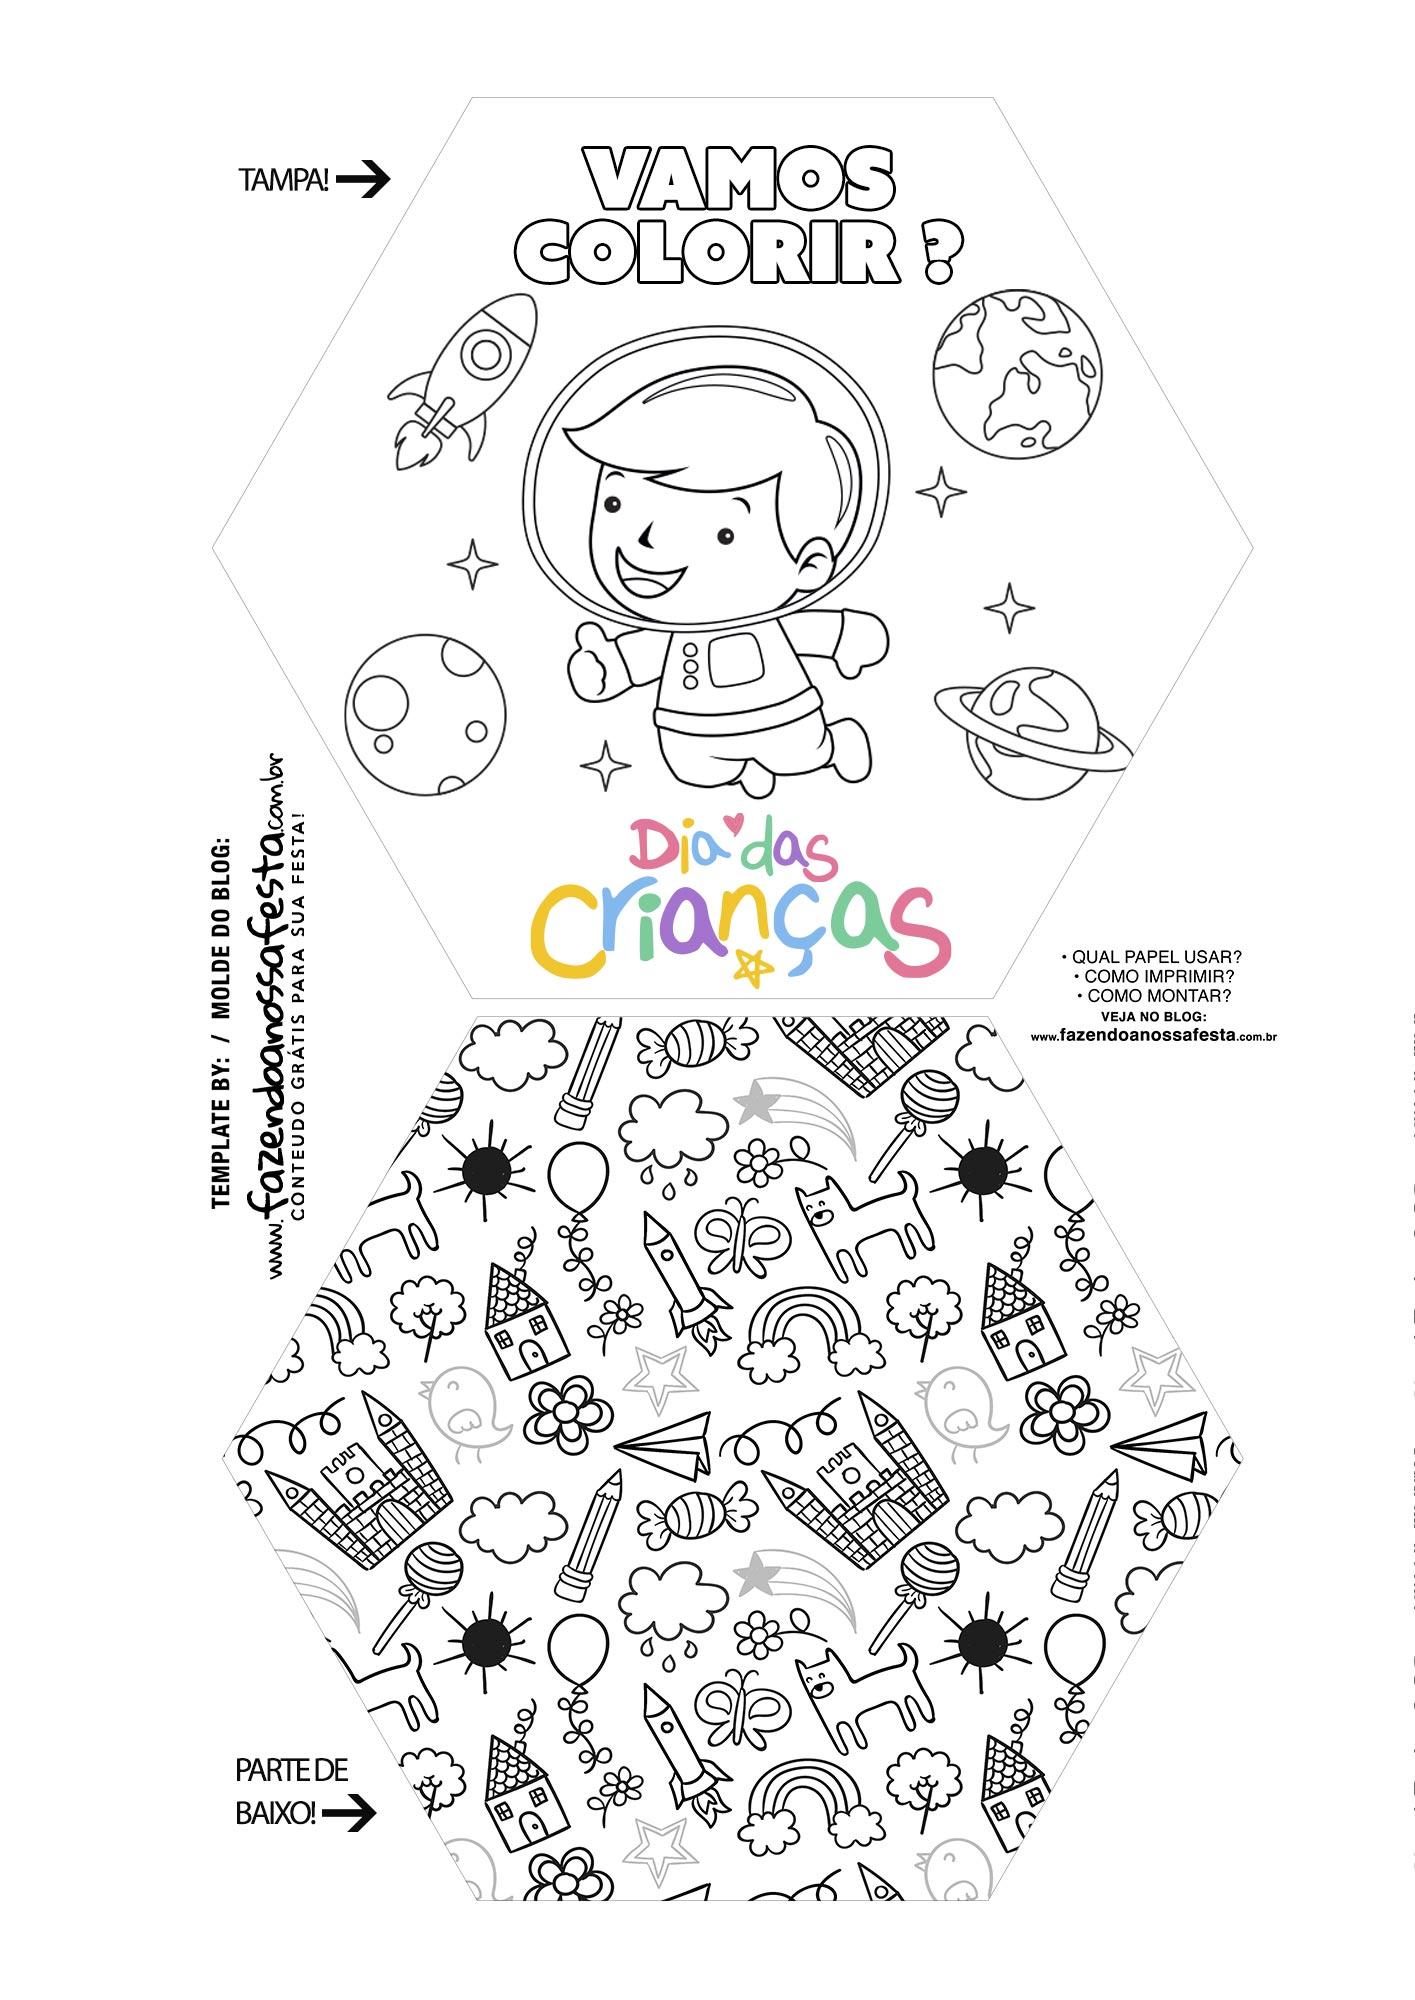 Caixa Explosiva Dia das Criancas para colorir astronauta